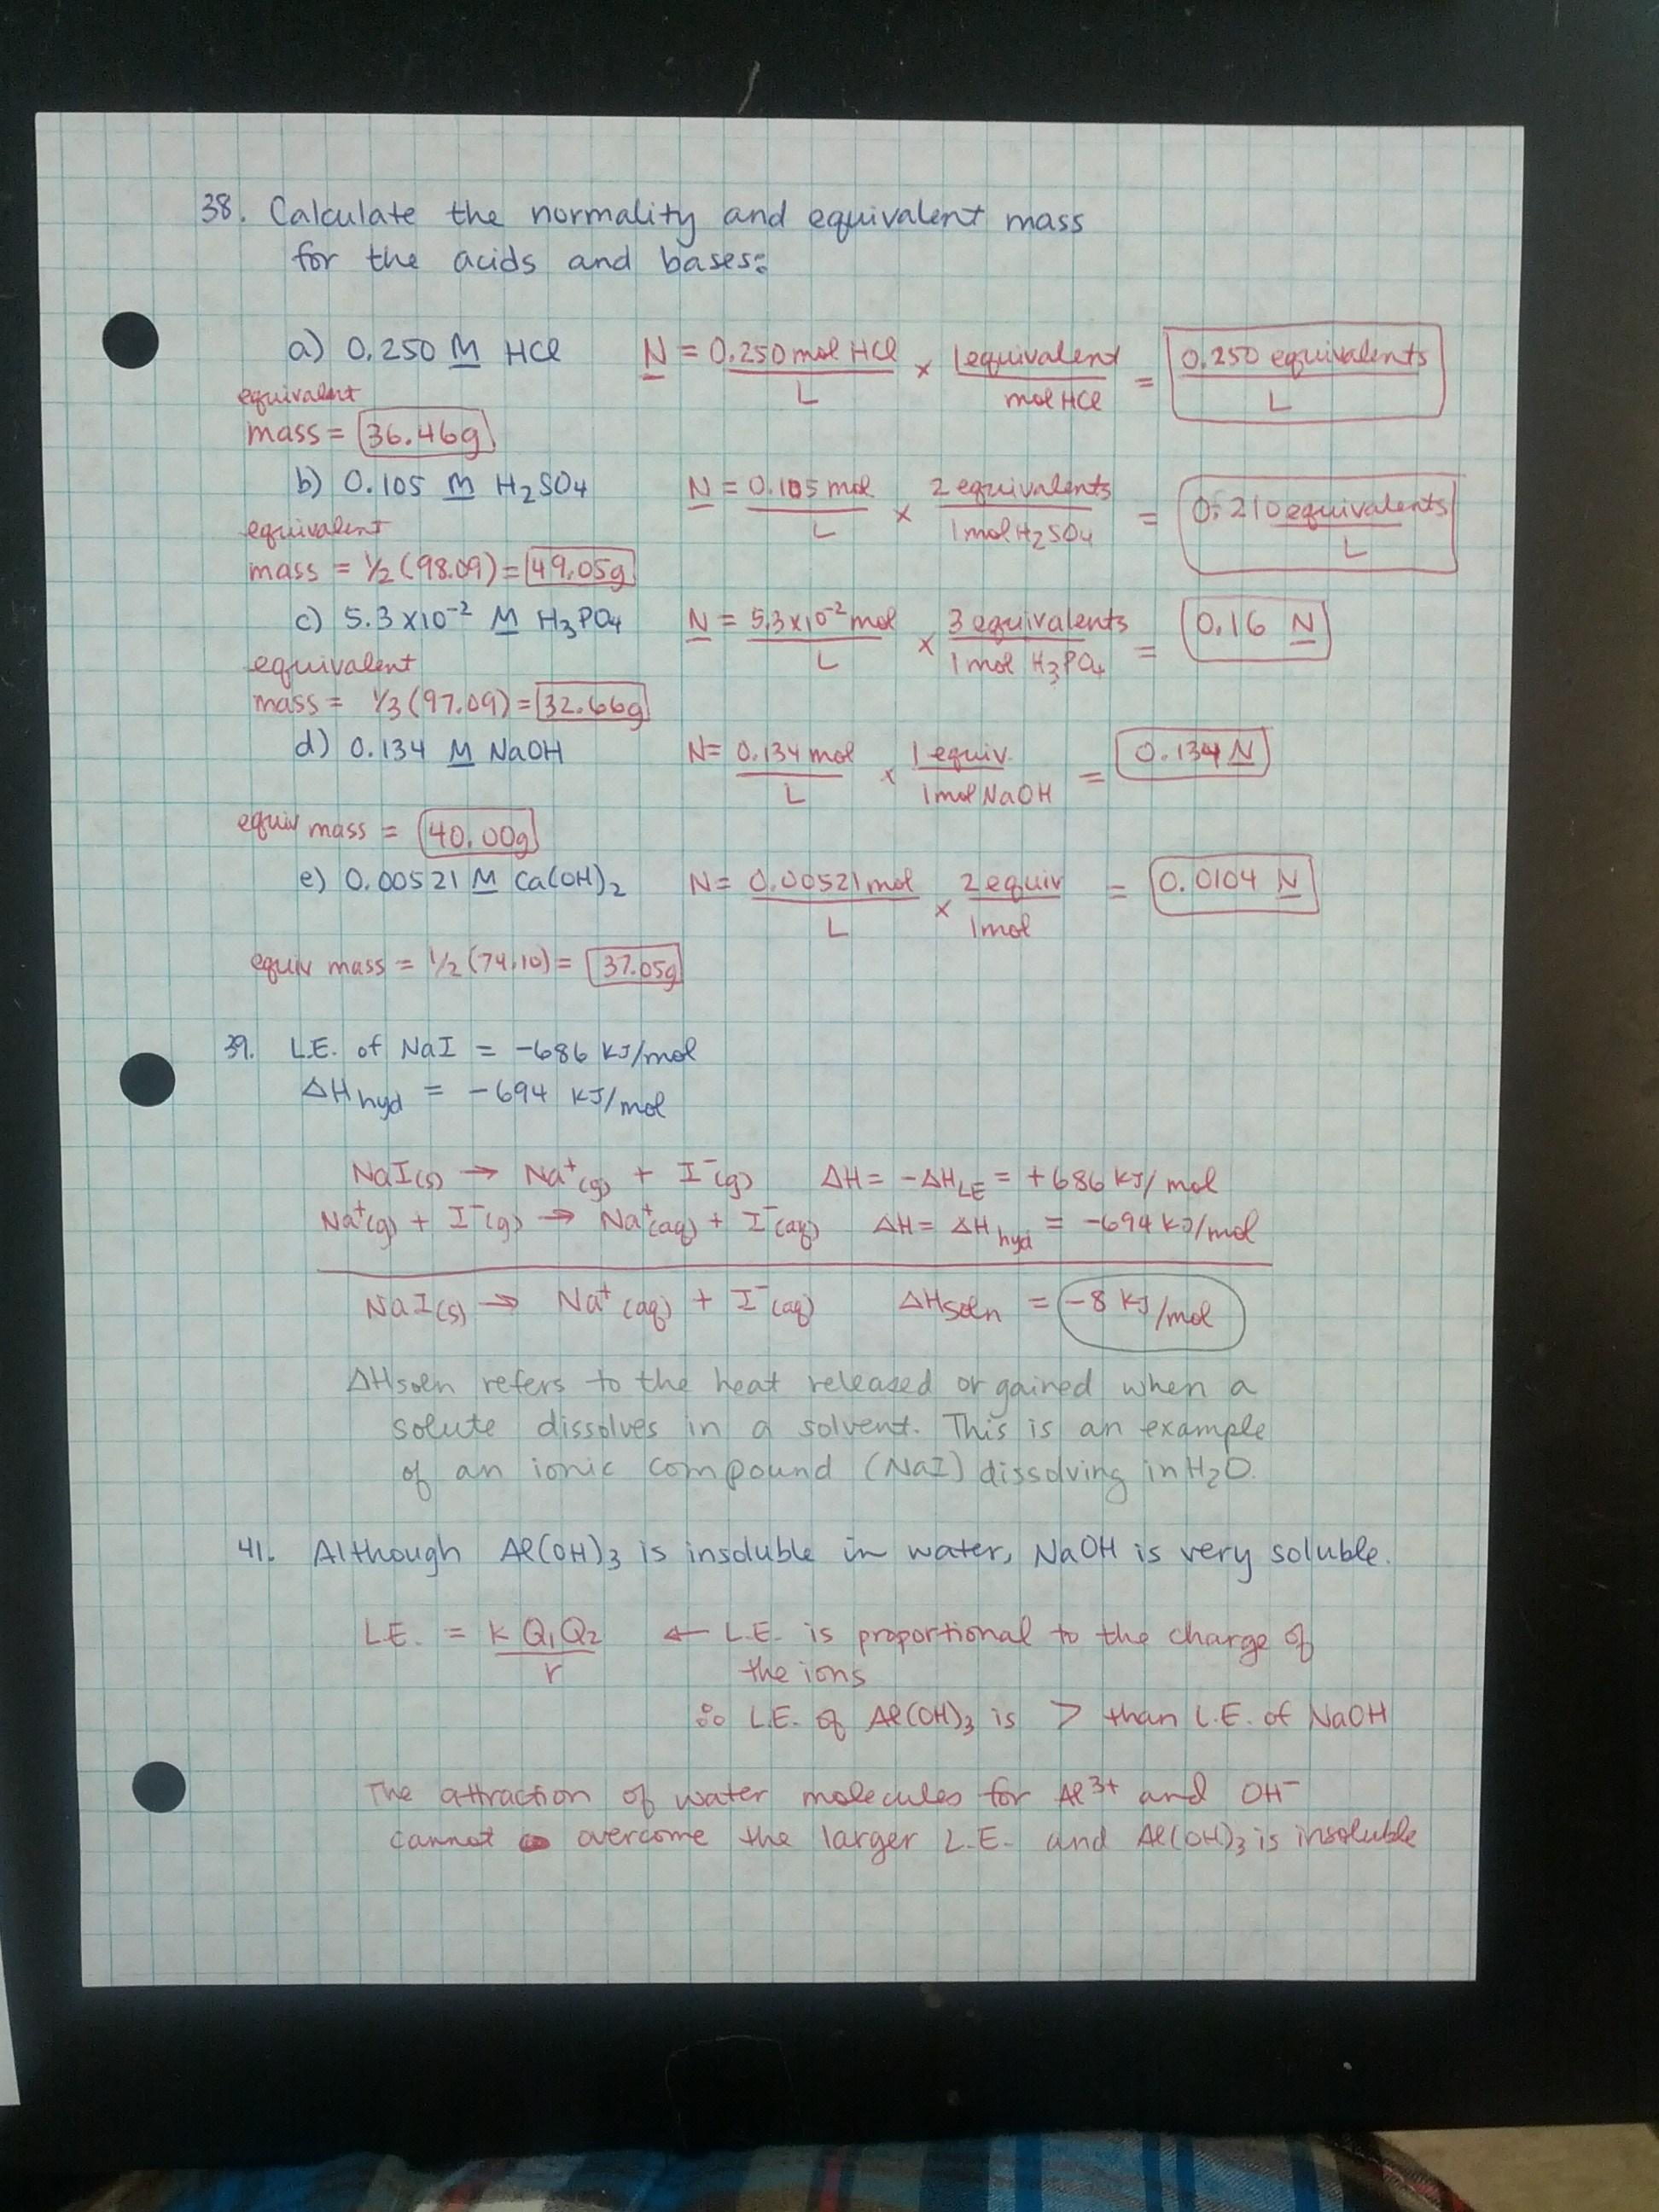 worksheet Determining The Formula Of A Hydrate Chem Worksheet 11 6 culver city high school apch11 2 ans2 jpg ans1 jpg